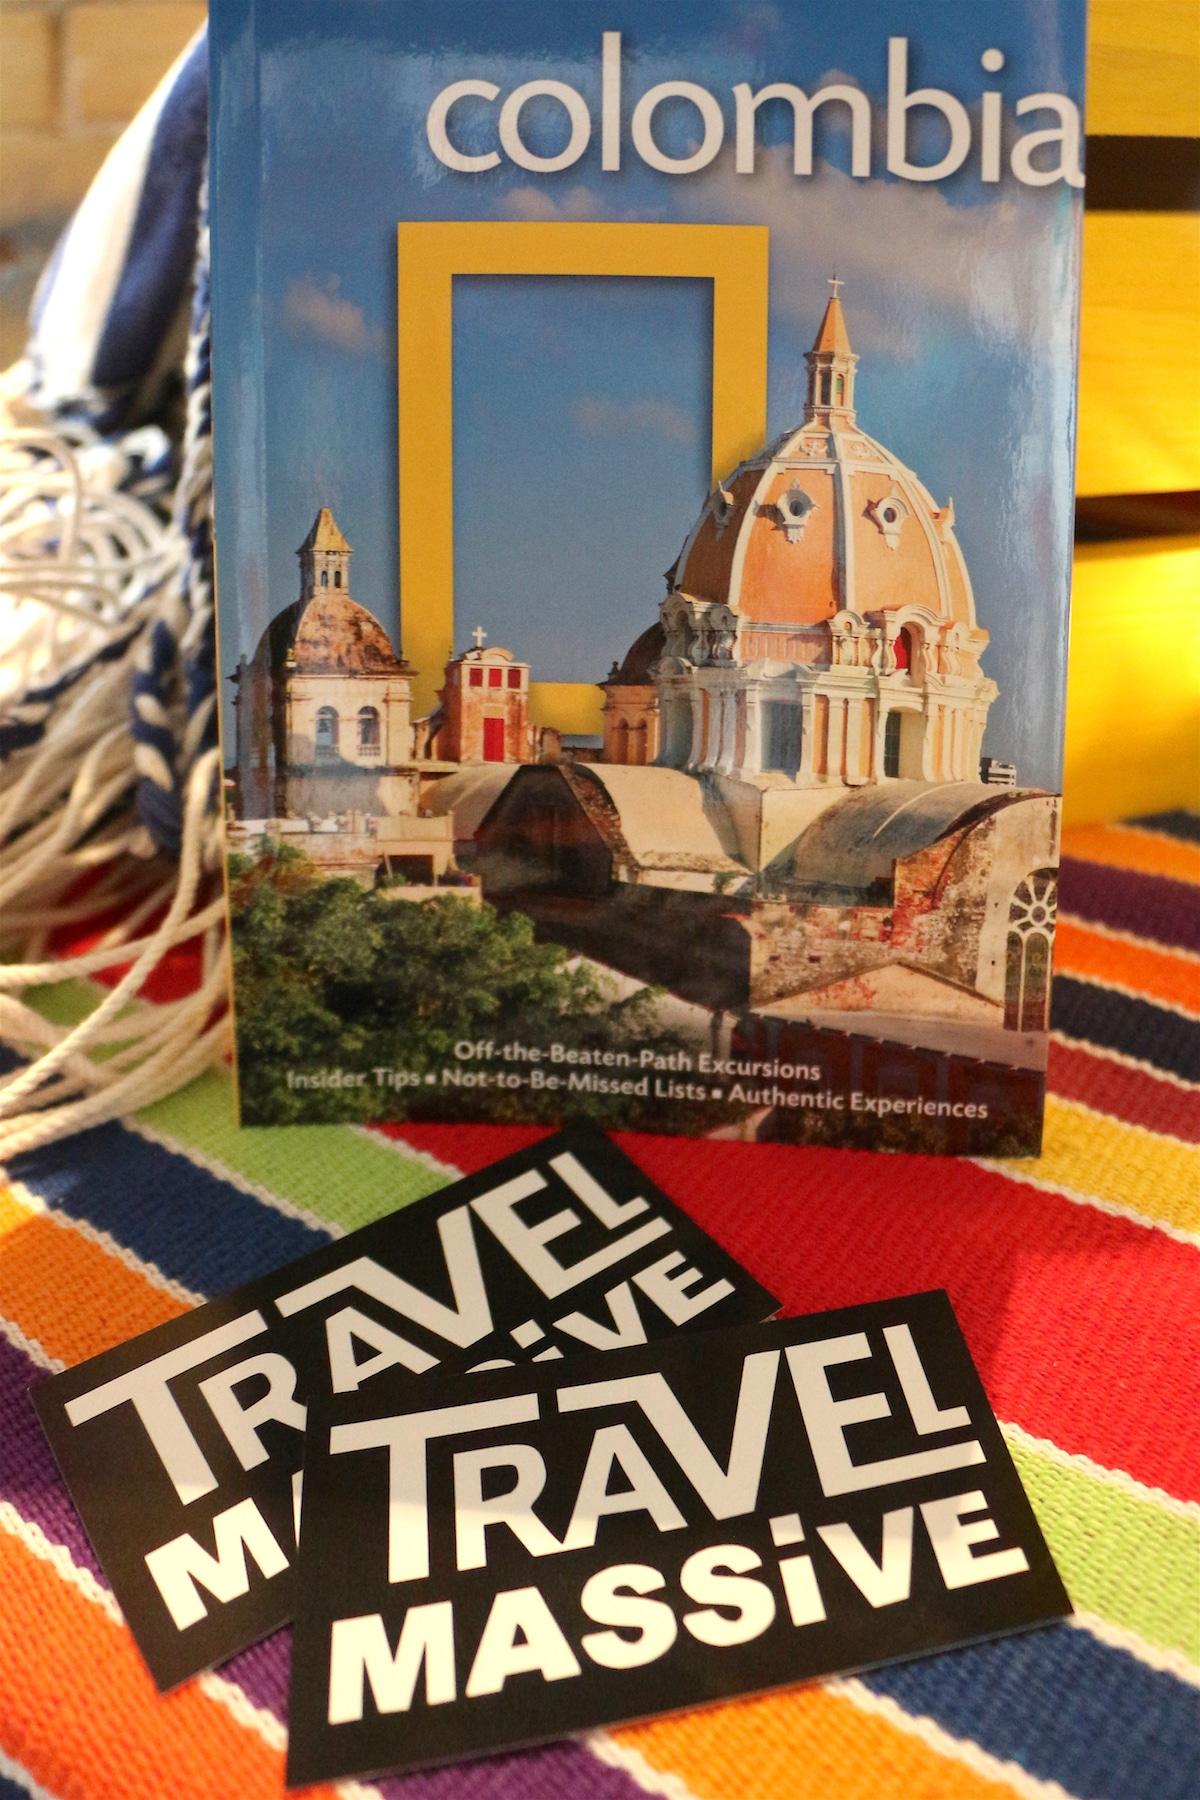 Columbia - Travel Massive Celebrates with Columbia.jpg